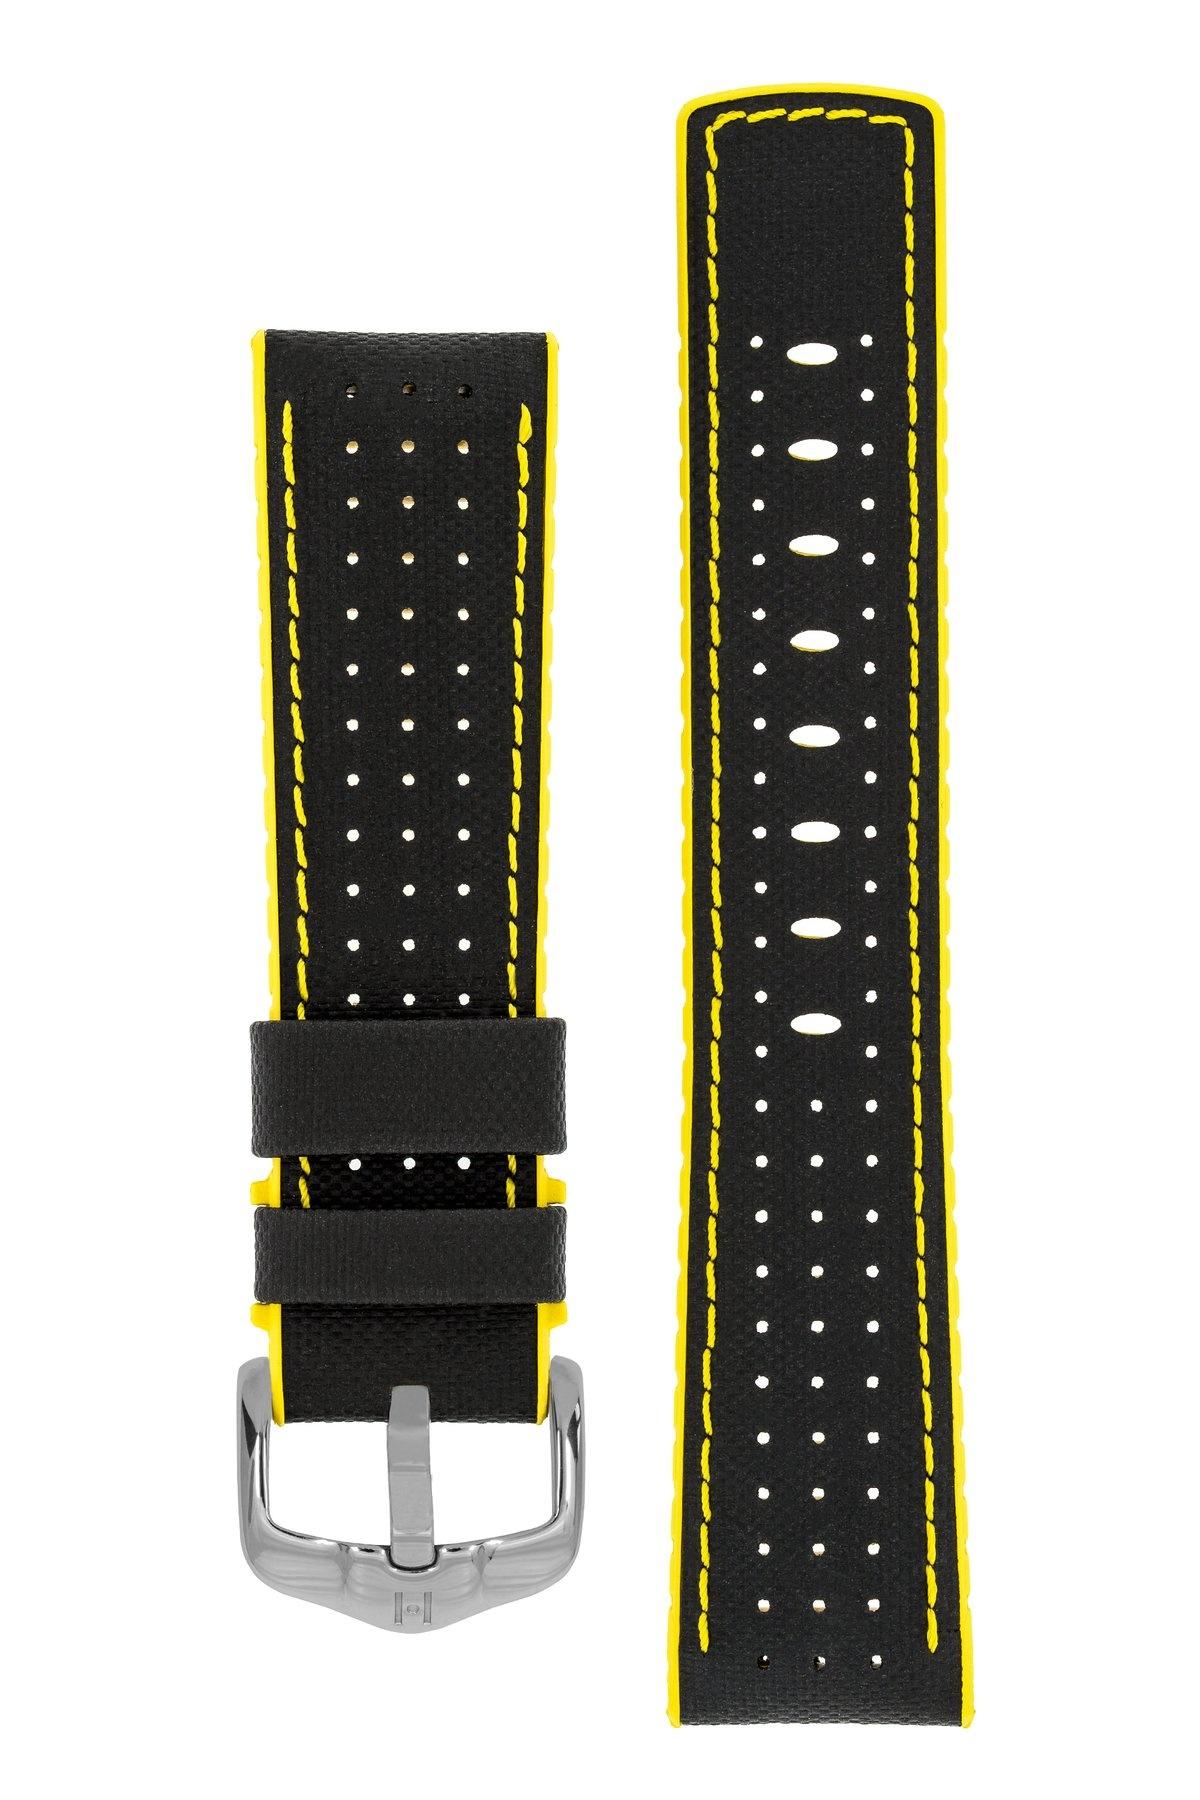 Horlogebandje Robby Kalfsleer + Premium Rubber 24 mm-6